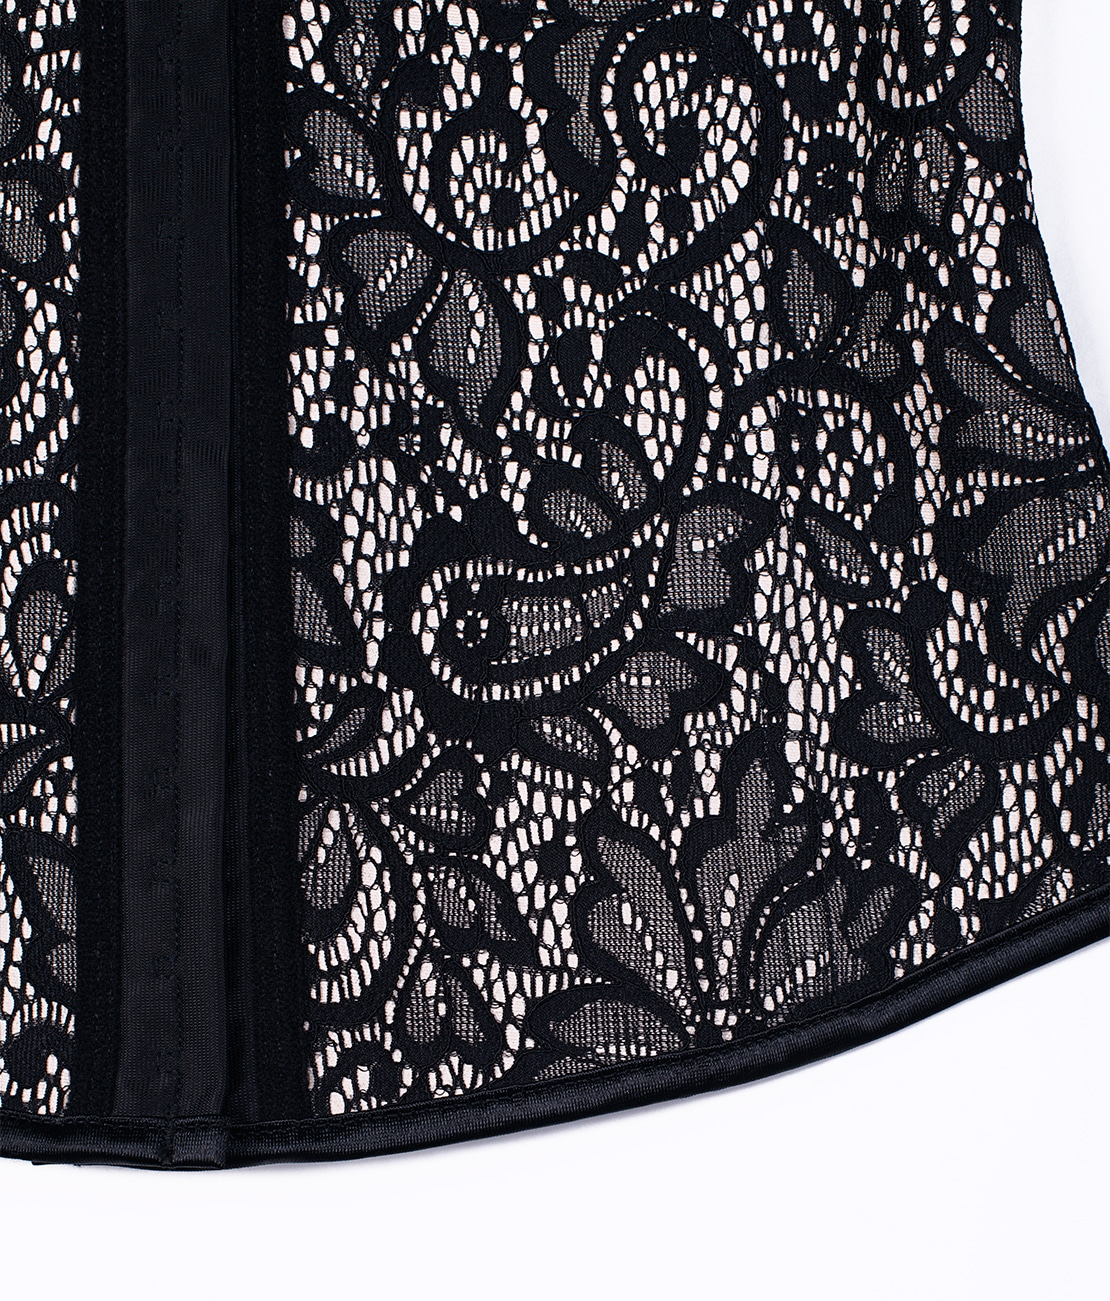 La Gaine Sexy Packshot Detail 2